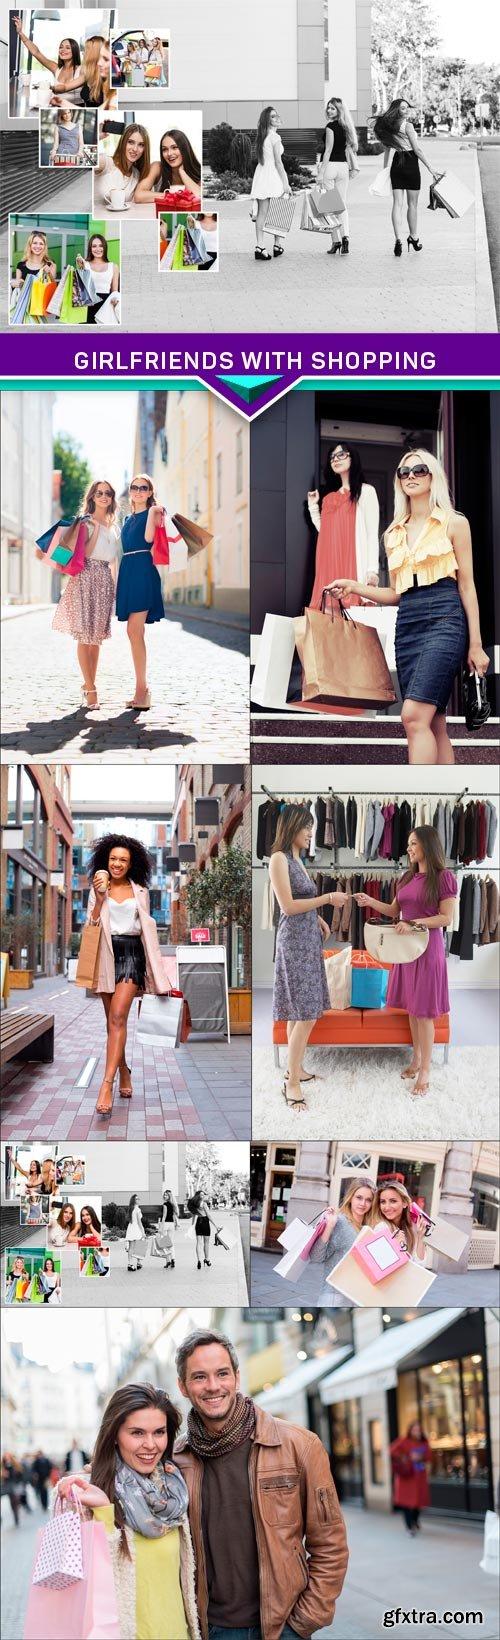 Girlfriends with shopping 7X JPEG